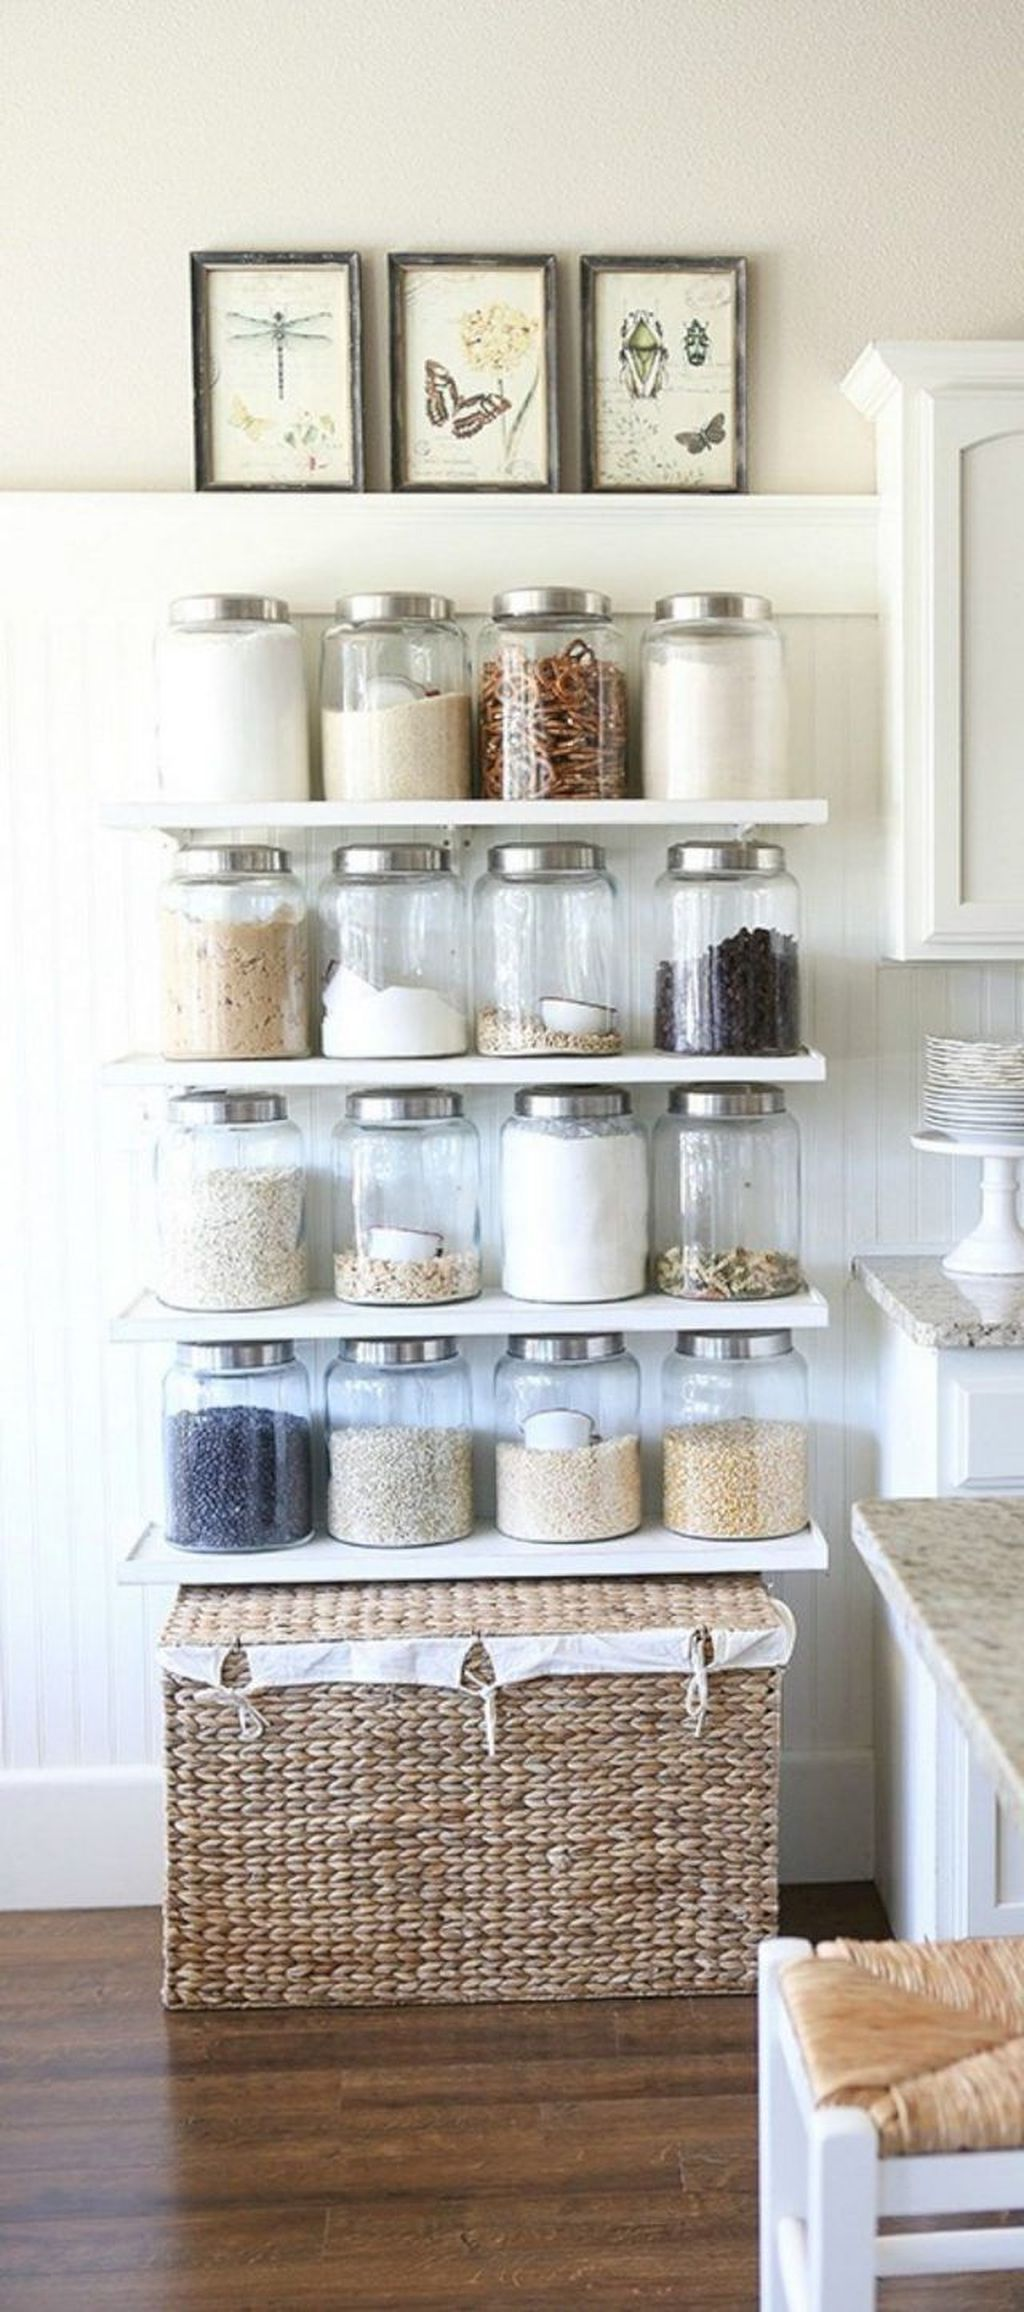 30 simple and easy kitchen storage organization ideas farmhouse kitchen decor farmhouse on kitchen decor organization id=72990